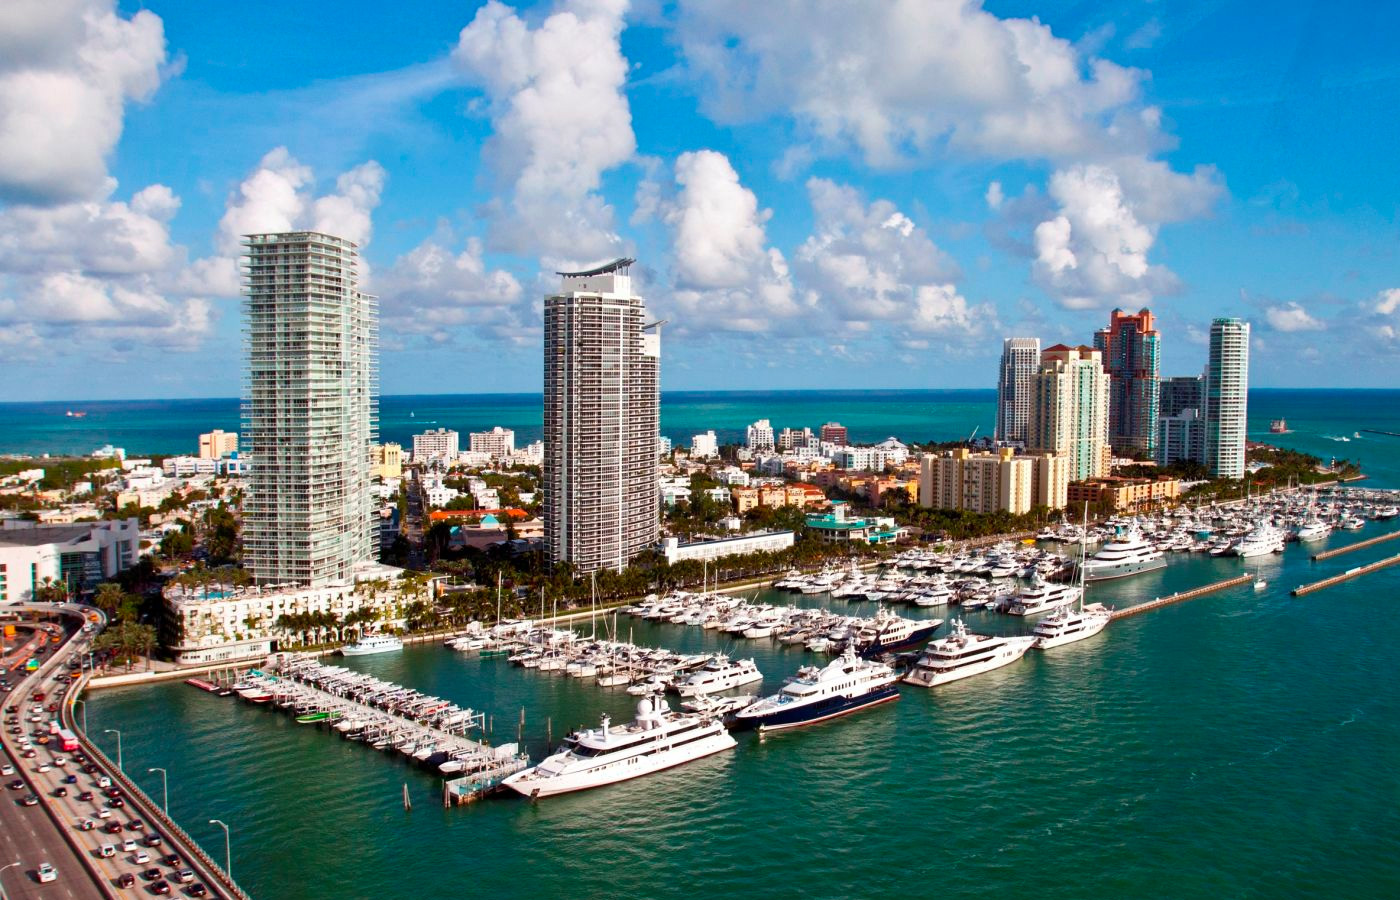 Denison Yachting Regains Control Of Website